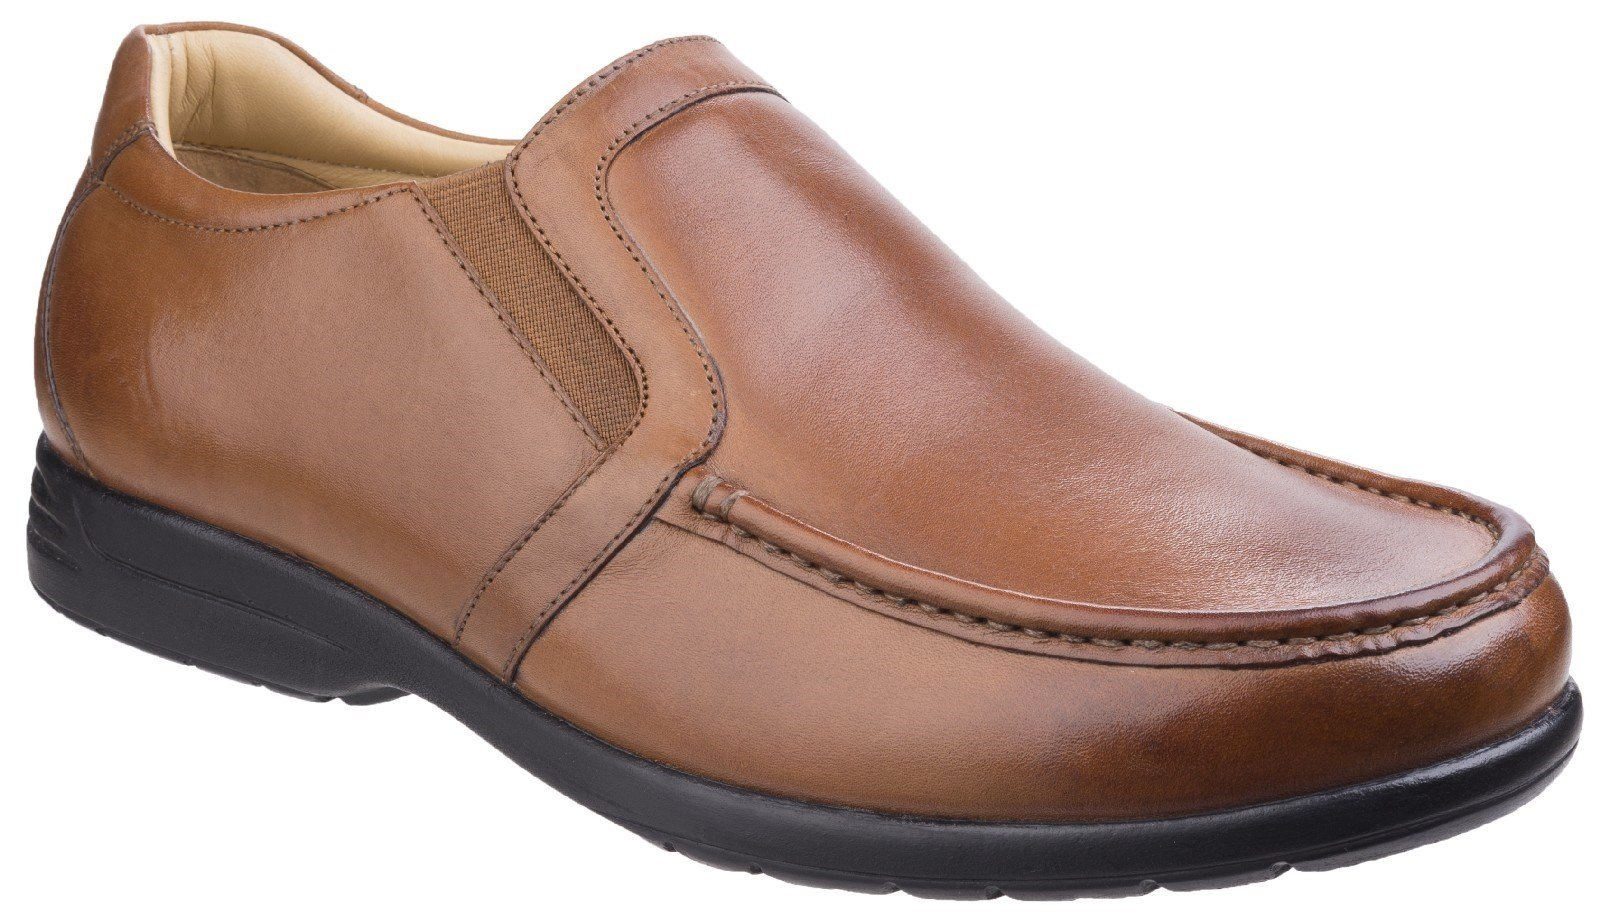 Fleet & Foster Men's Gordon Dual Fit Shoe Black 26319-43935 - Tan 6